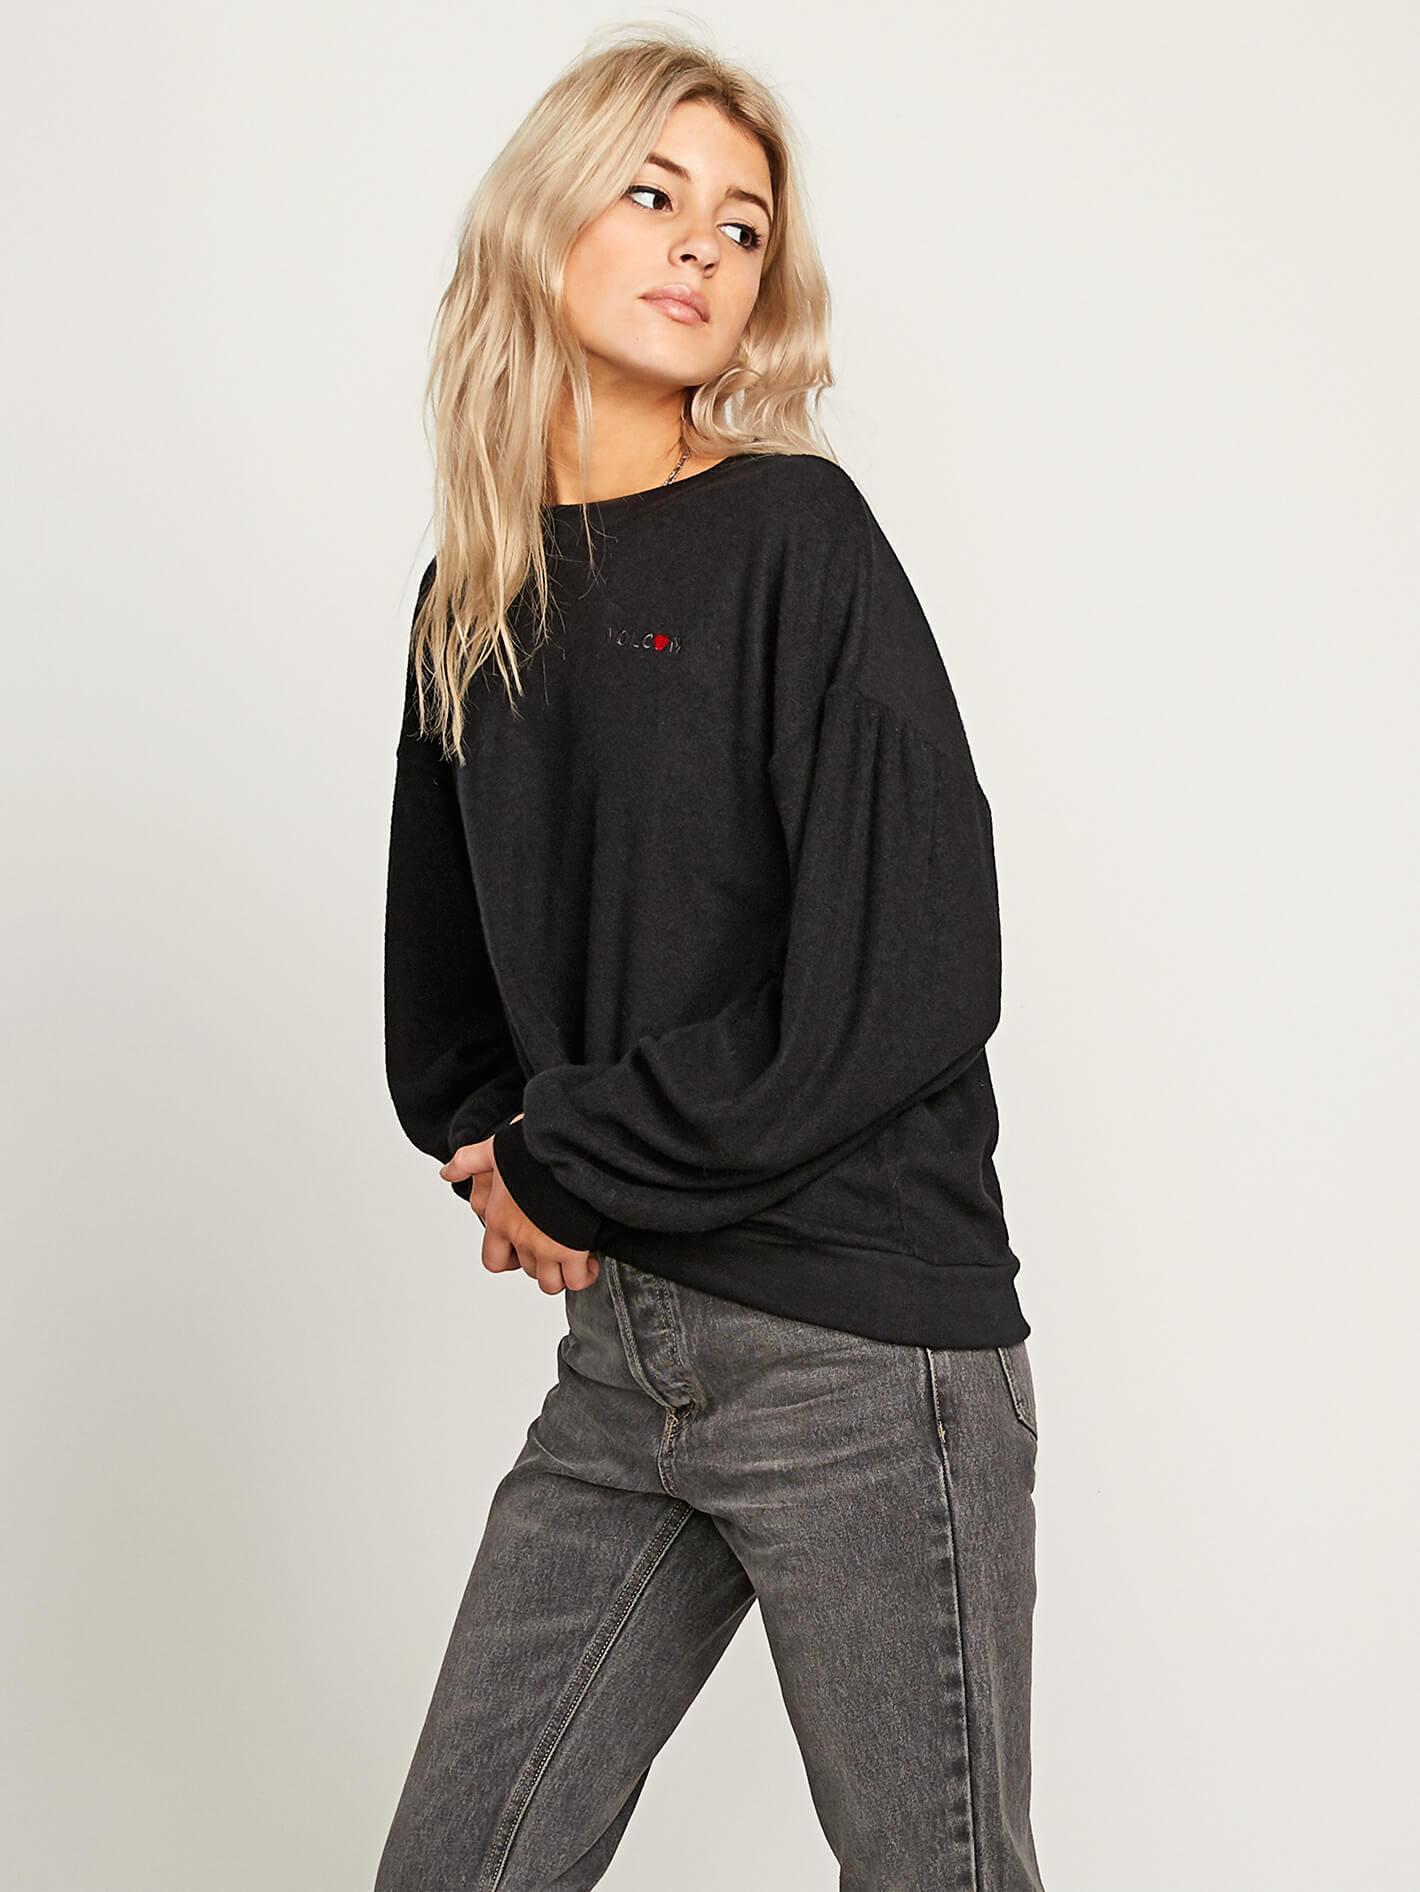 Fullscreen Fleece Sweatshirt Black Crew Volcom Lyst Pleaze View vw0Pp5q